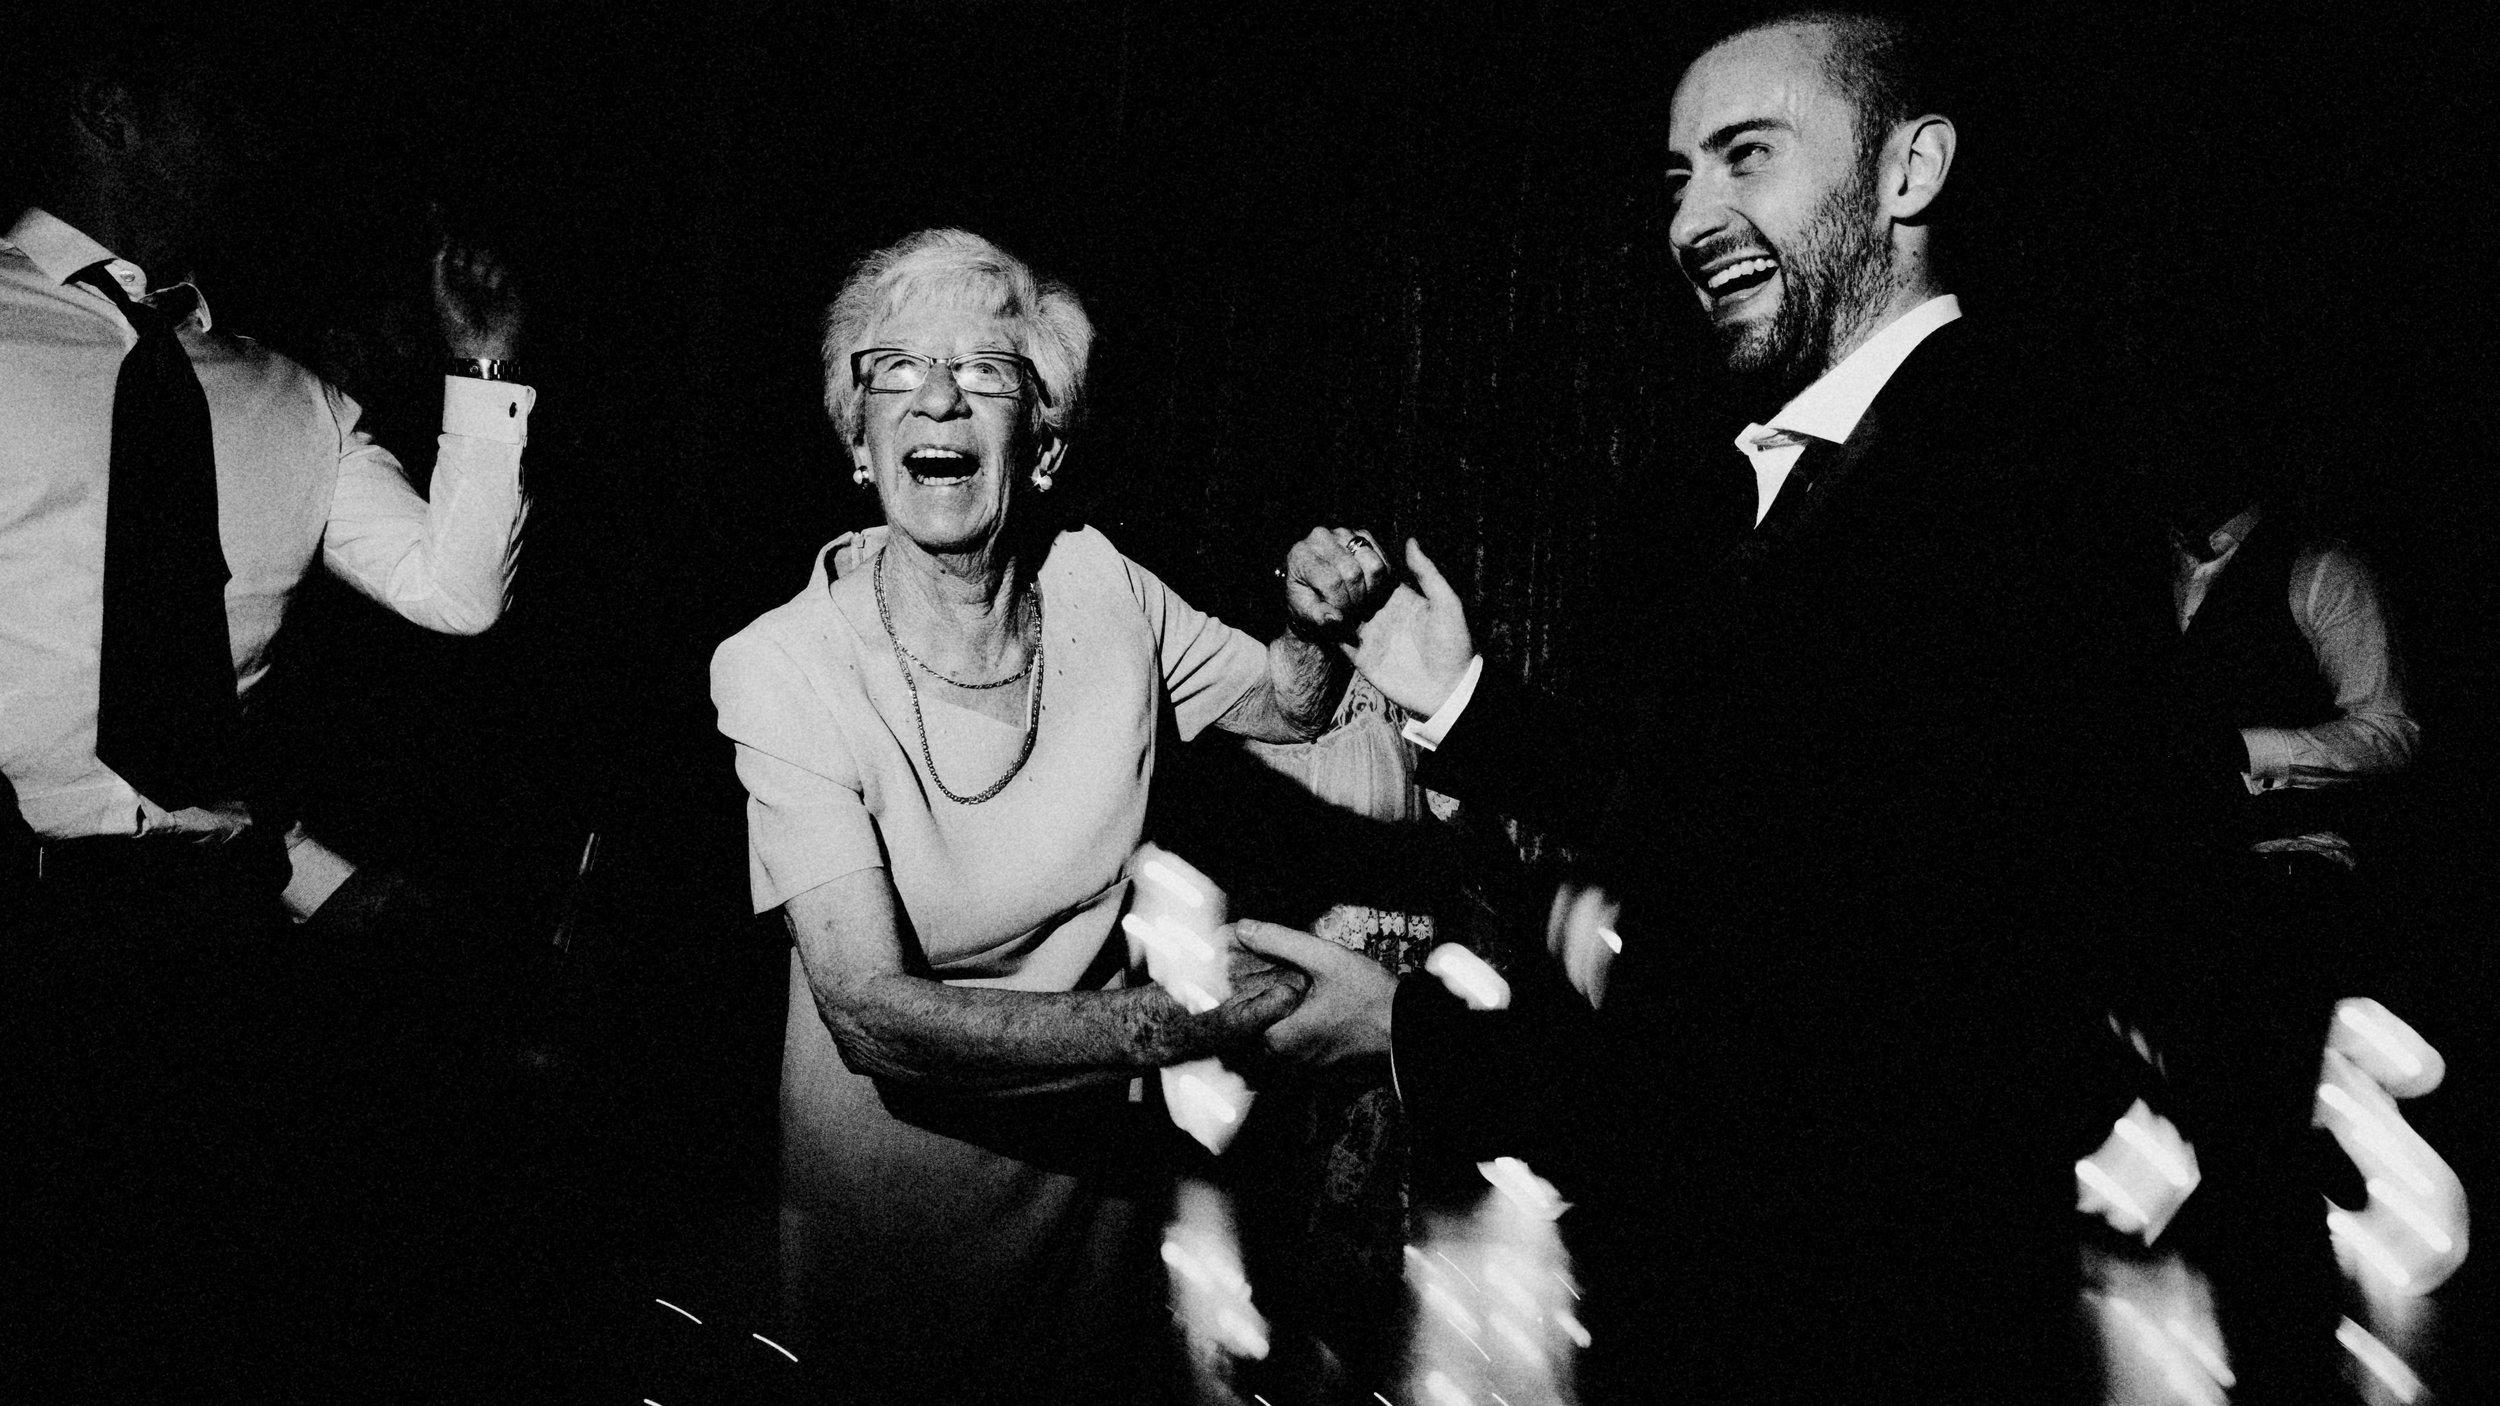 dancing with grandma at liverpool wedding